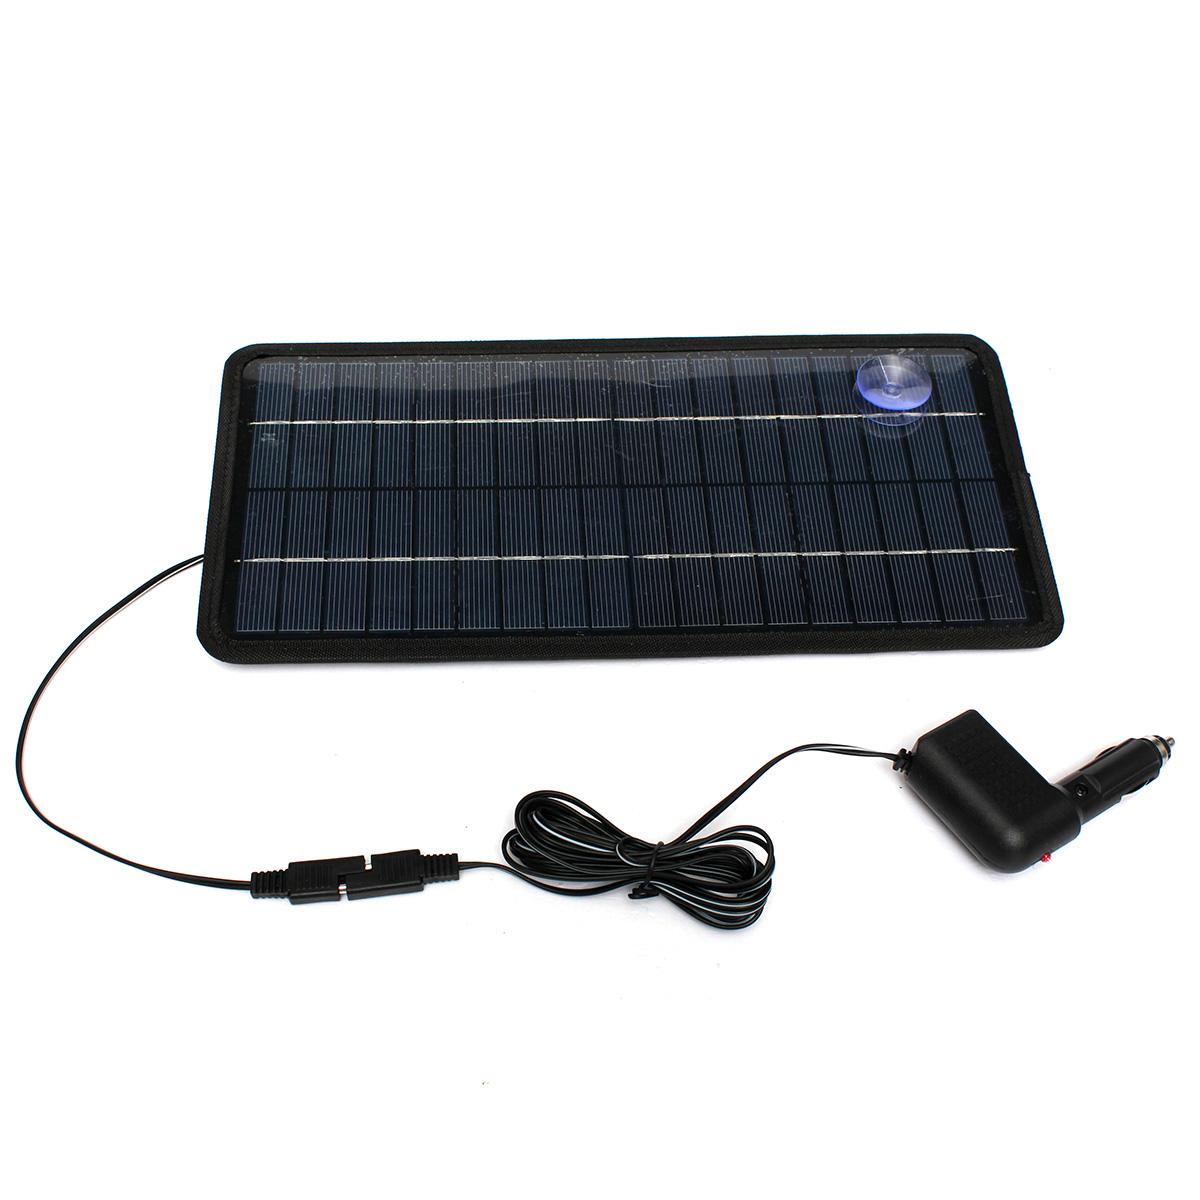 12v 8 5w panneau solaire charge soleil chargeur batterie. Black Bedroom Furniture Sets. Home Design Ideas